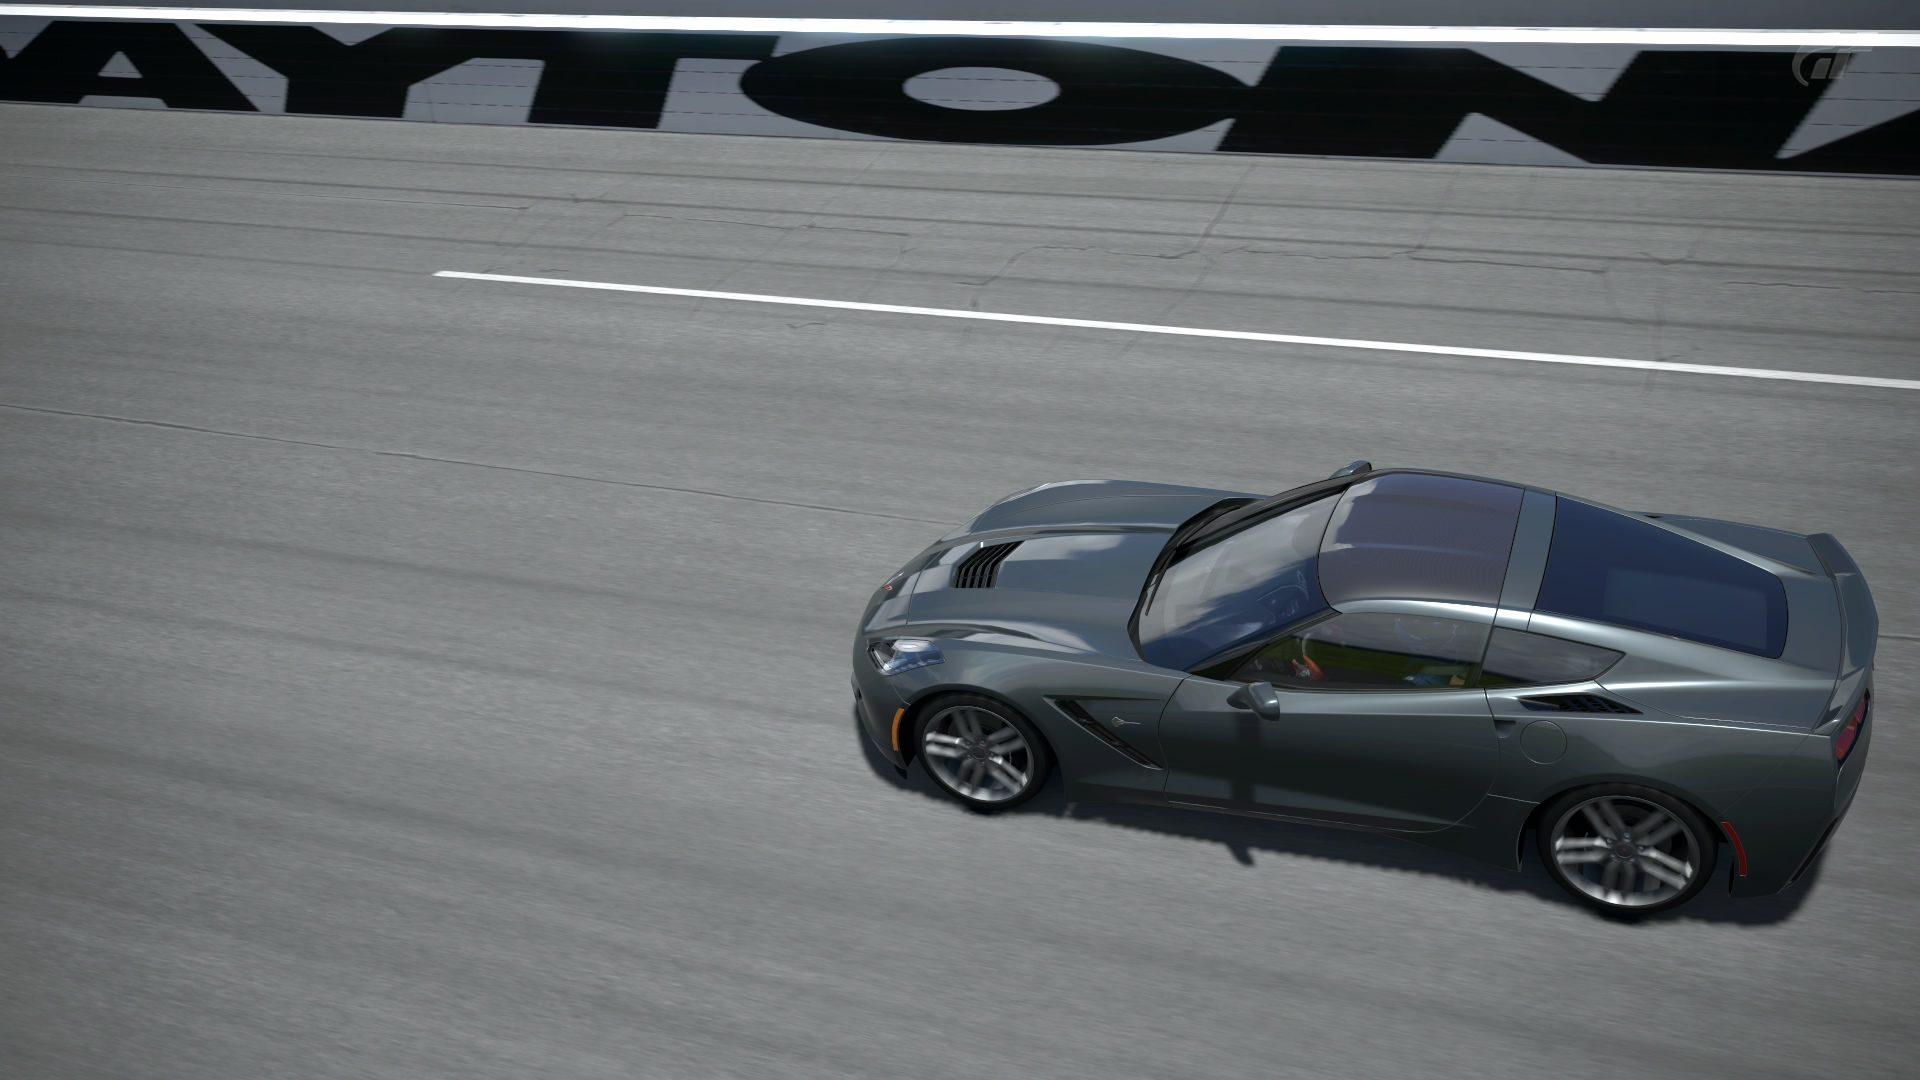 Road Course - Daytona_1.jpg